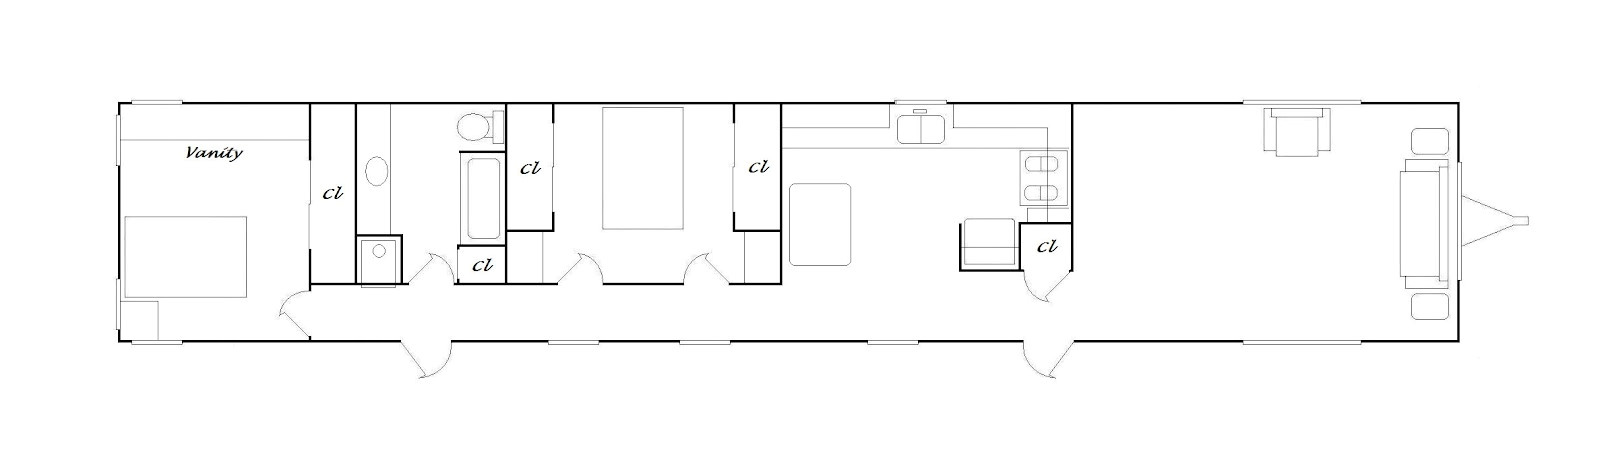 Marshfield Mobile Homes Floor Plans Portable Levittown 1967 Models